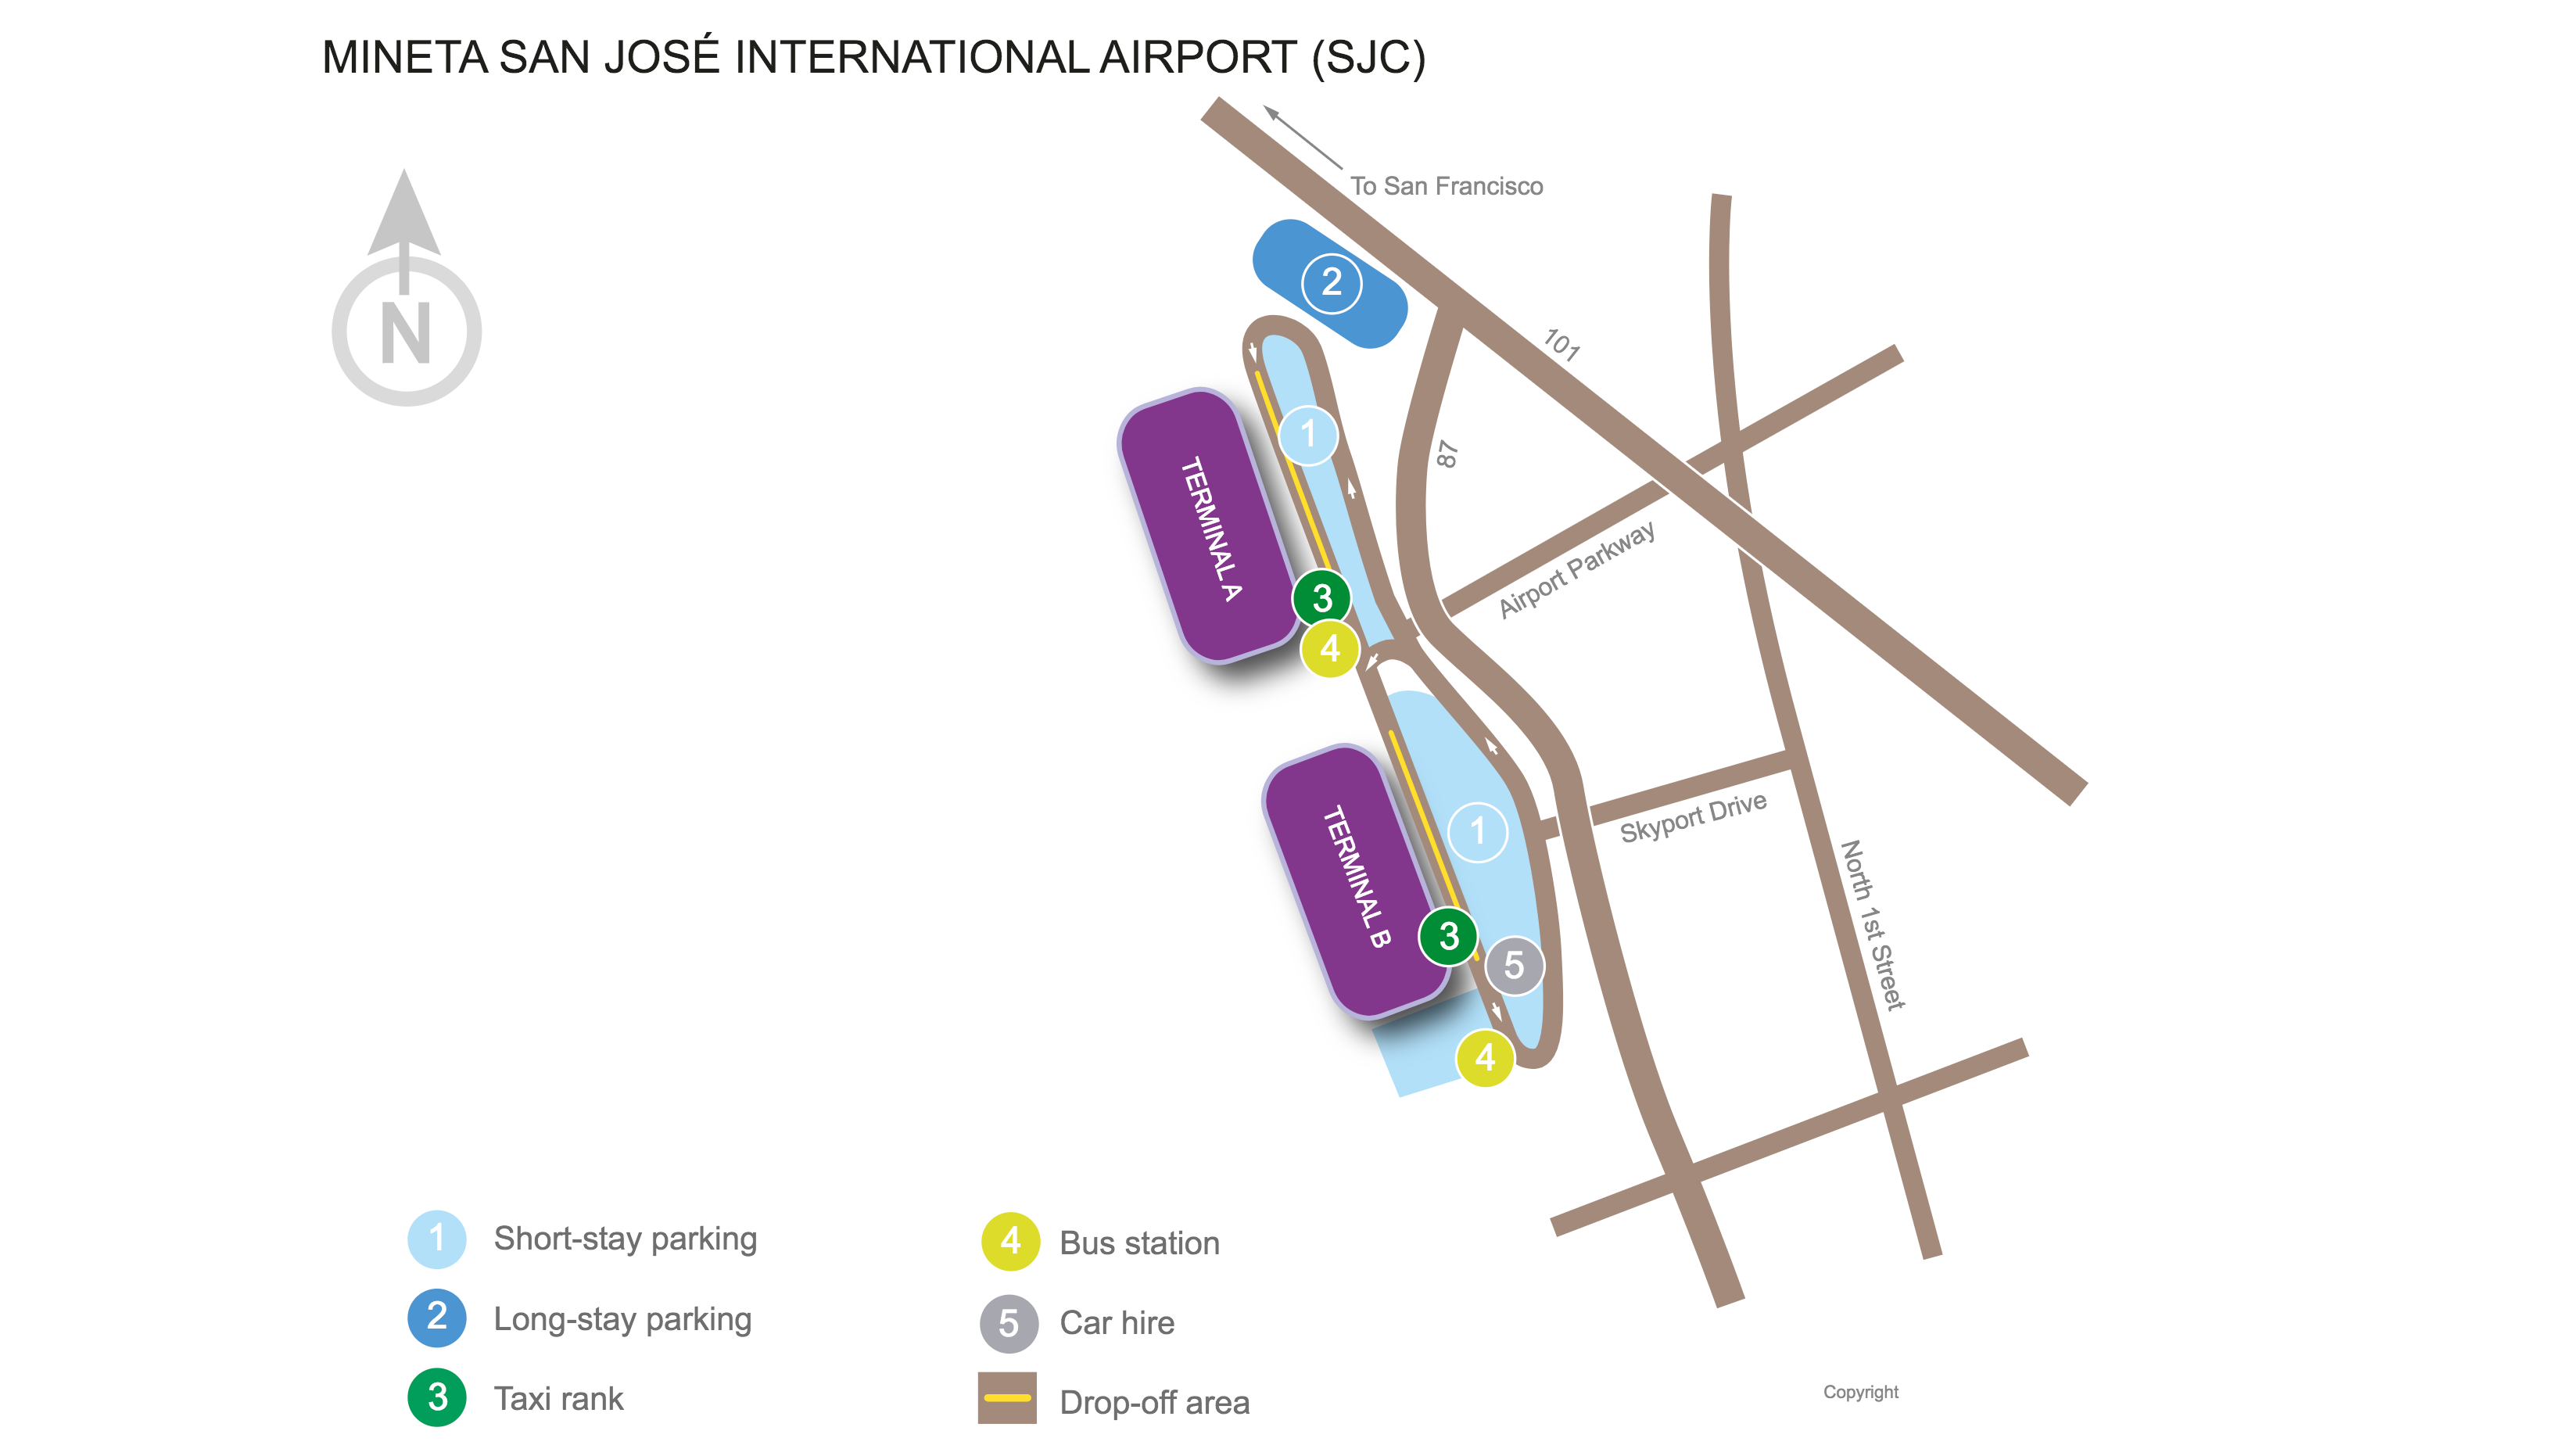 Mineta San José International Airport (SJC) map